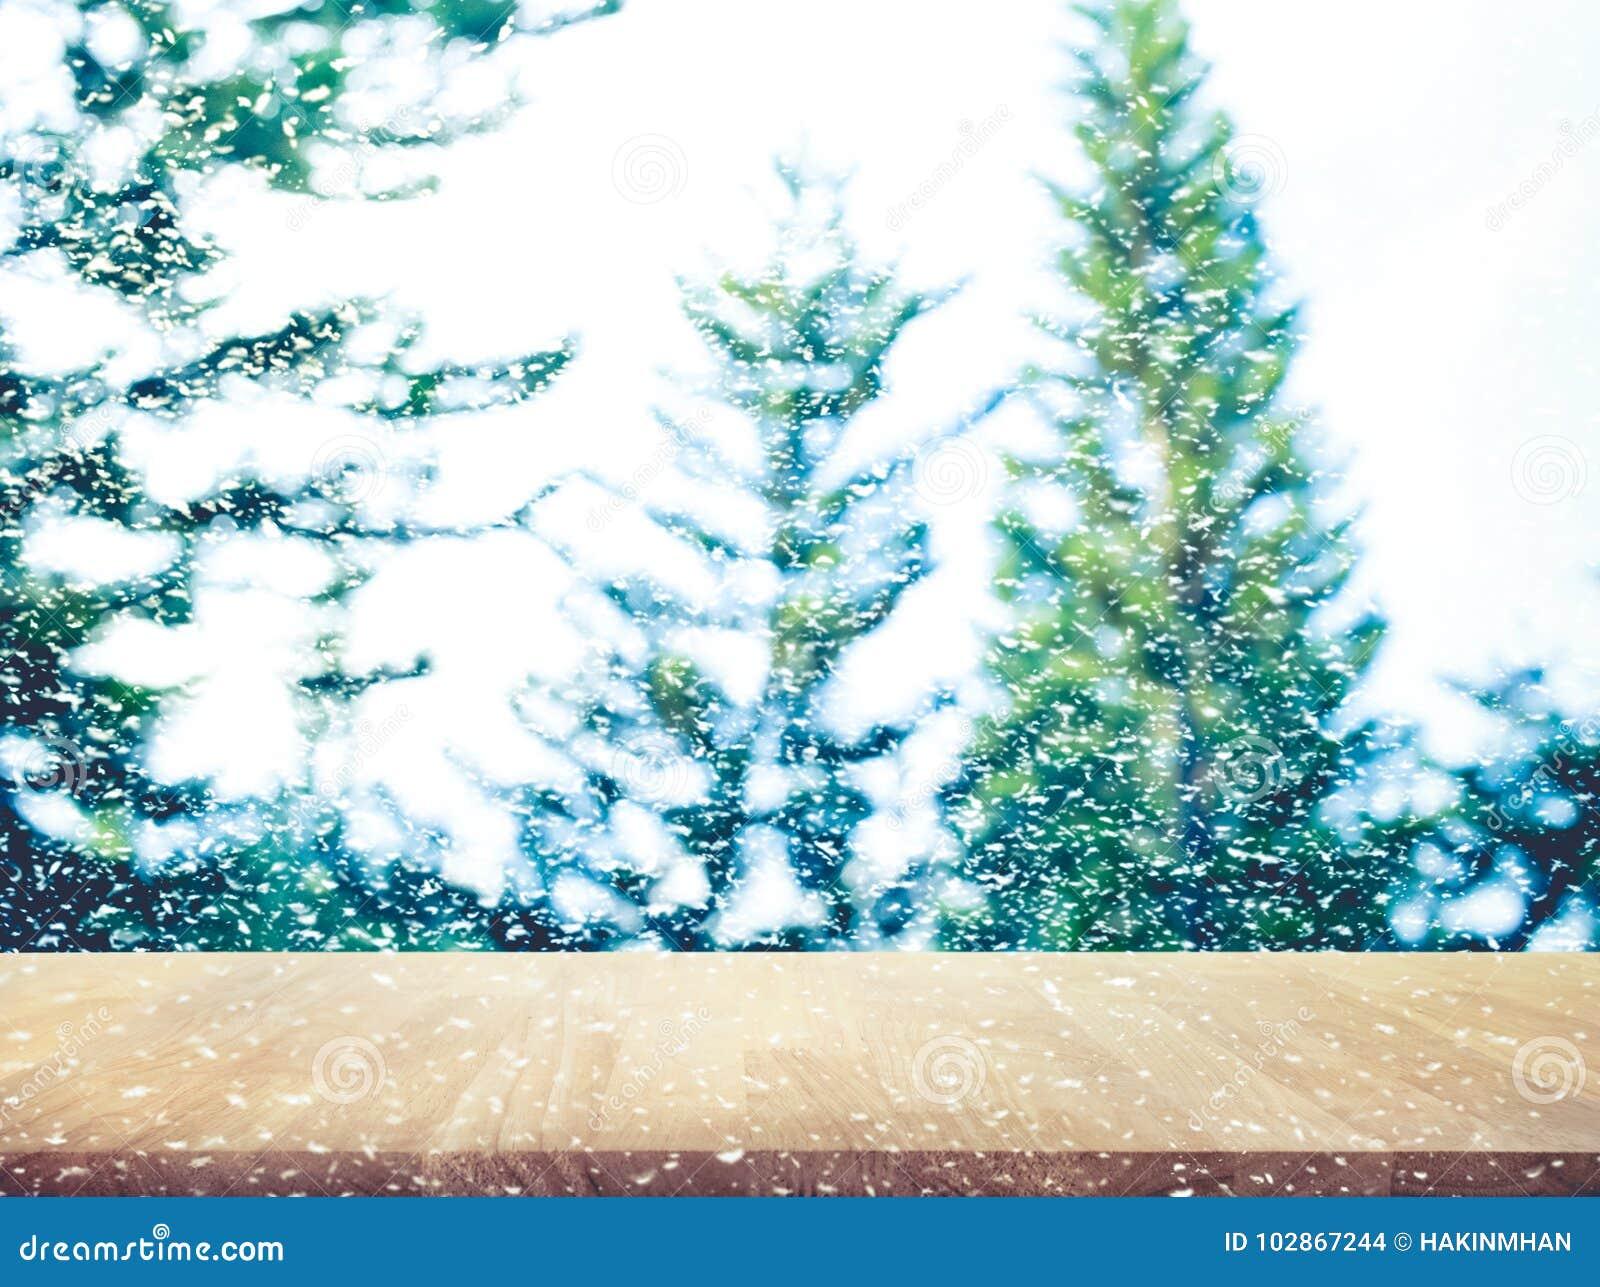 Christmas Counter.Wooden Table On Pine Tree And Snowfall Christmas Decoration